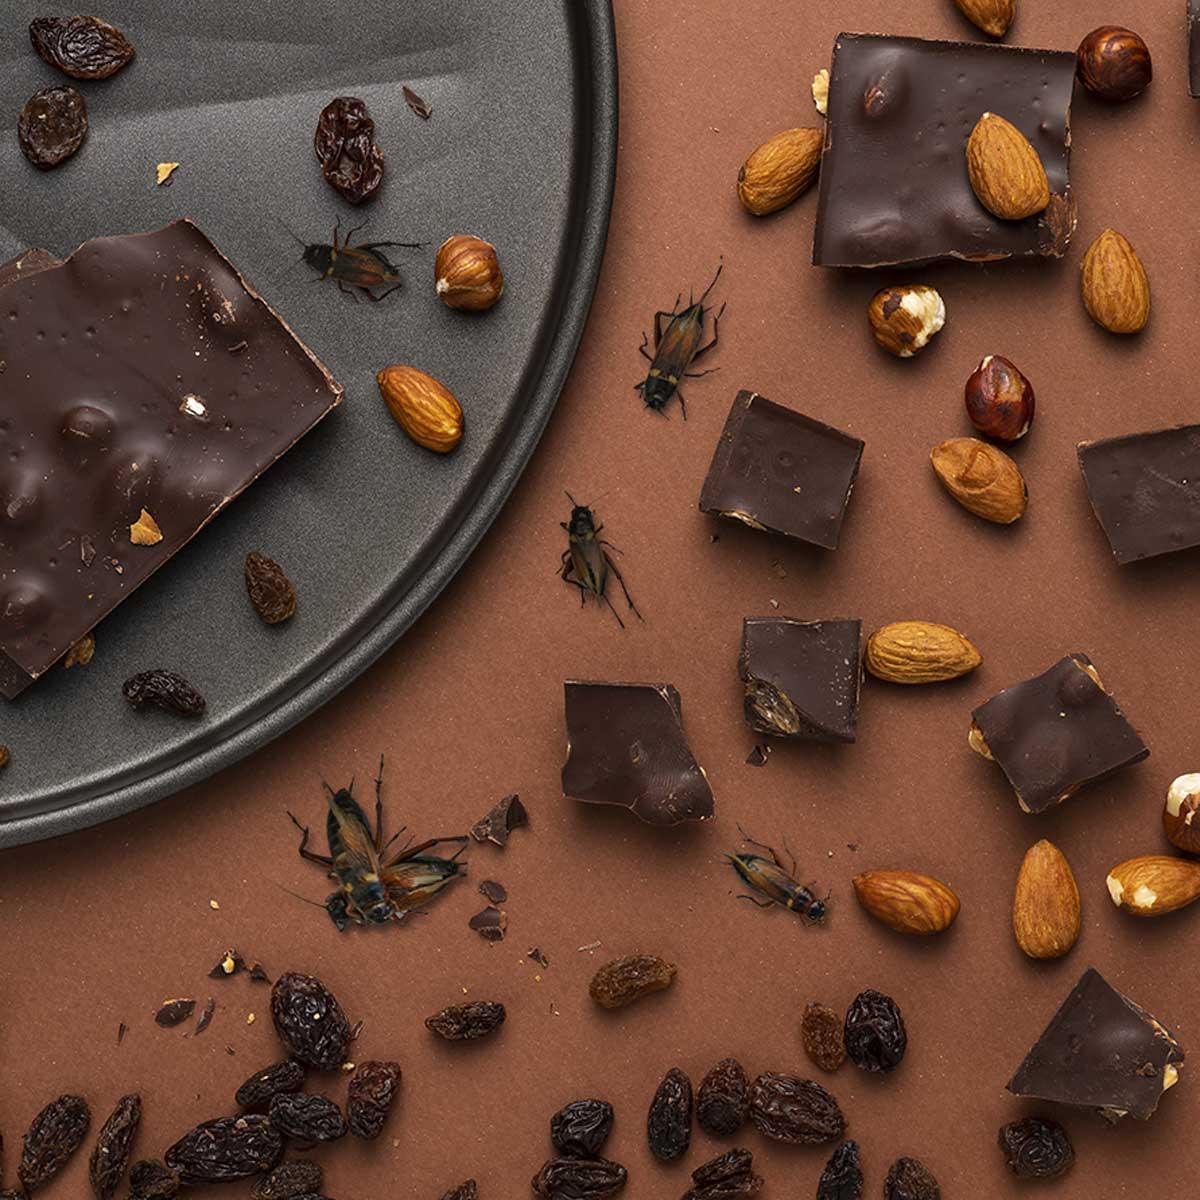 Crickets & Chocolate